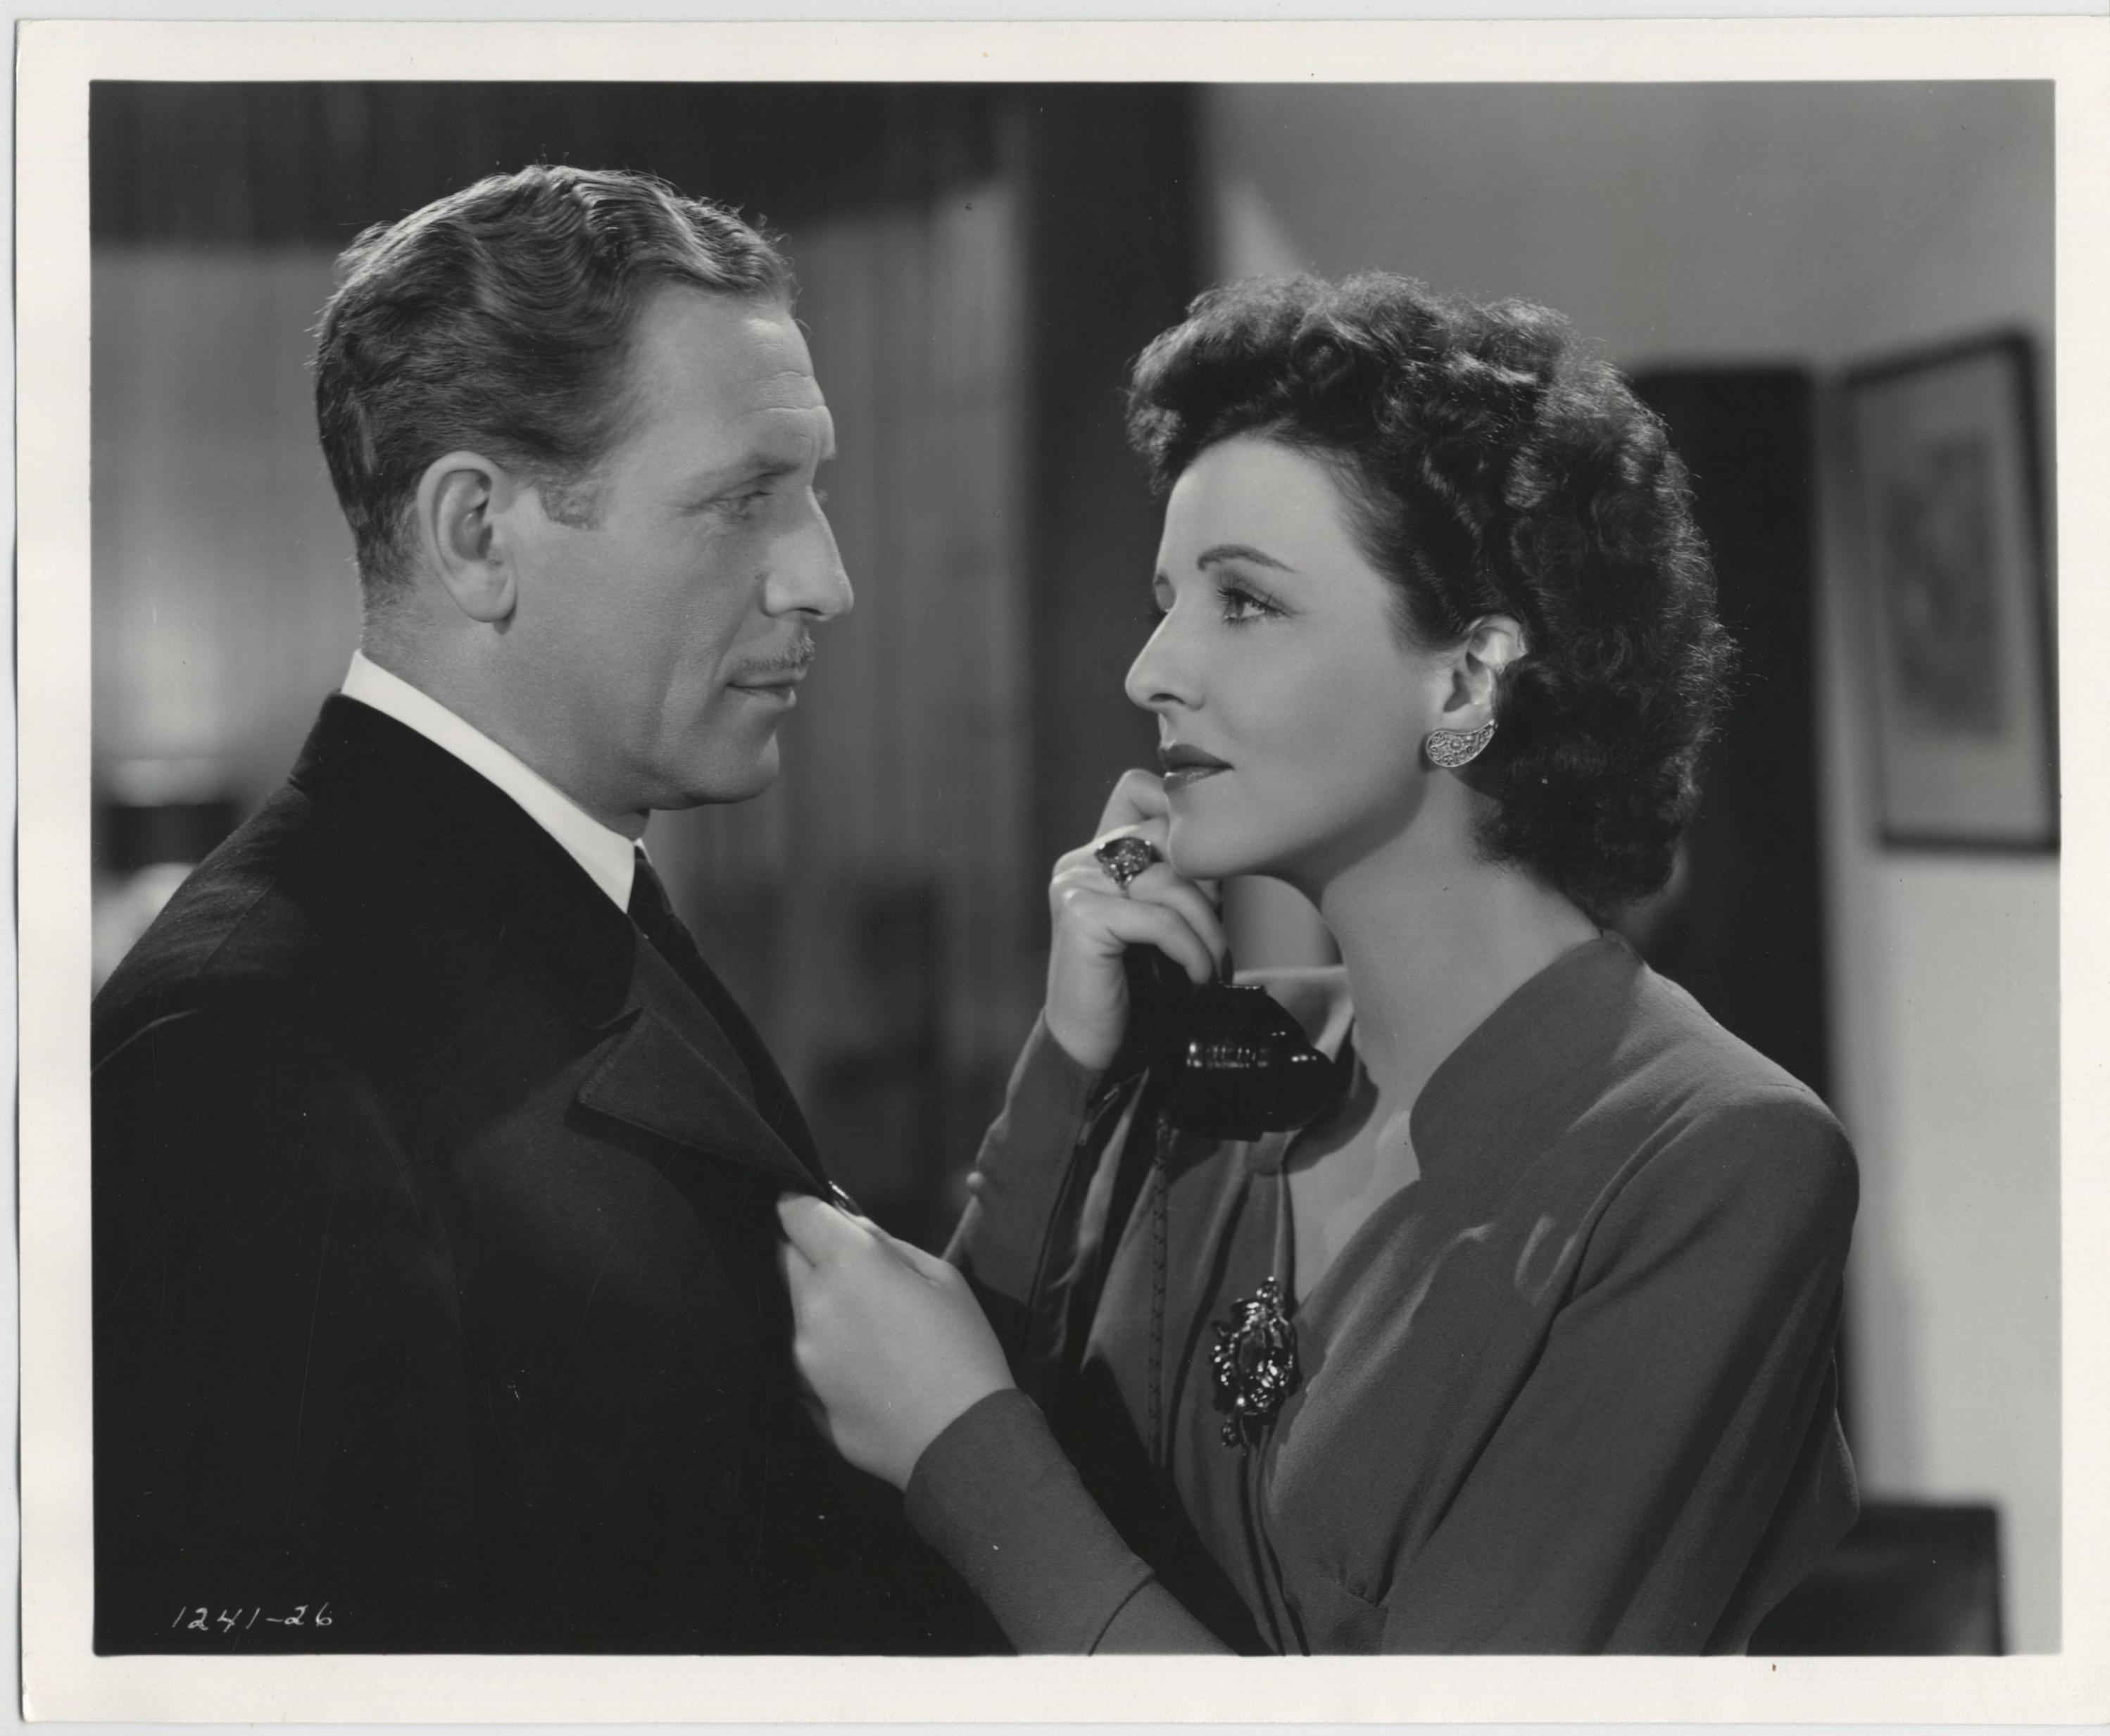 Paul Cavanagh and Mona Maris in Pacific Rendezvous (1942)